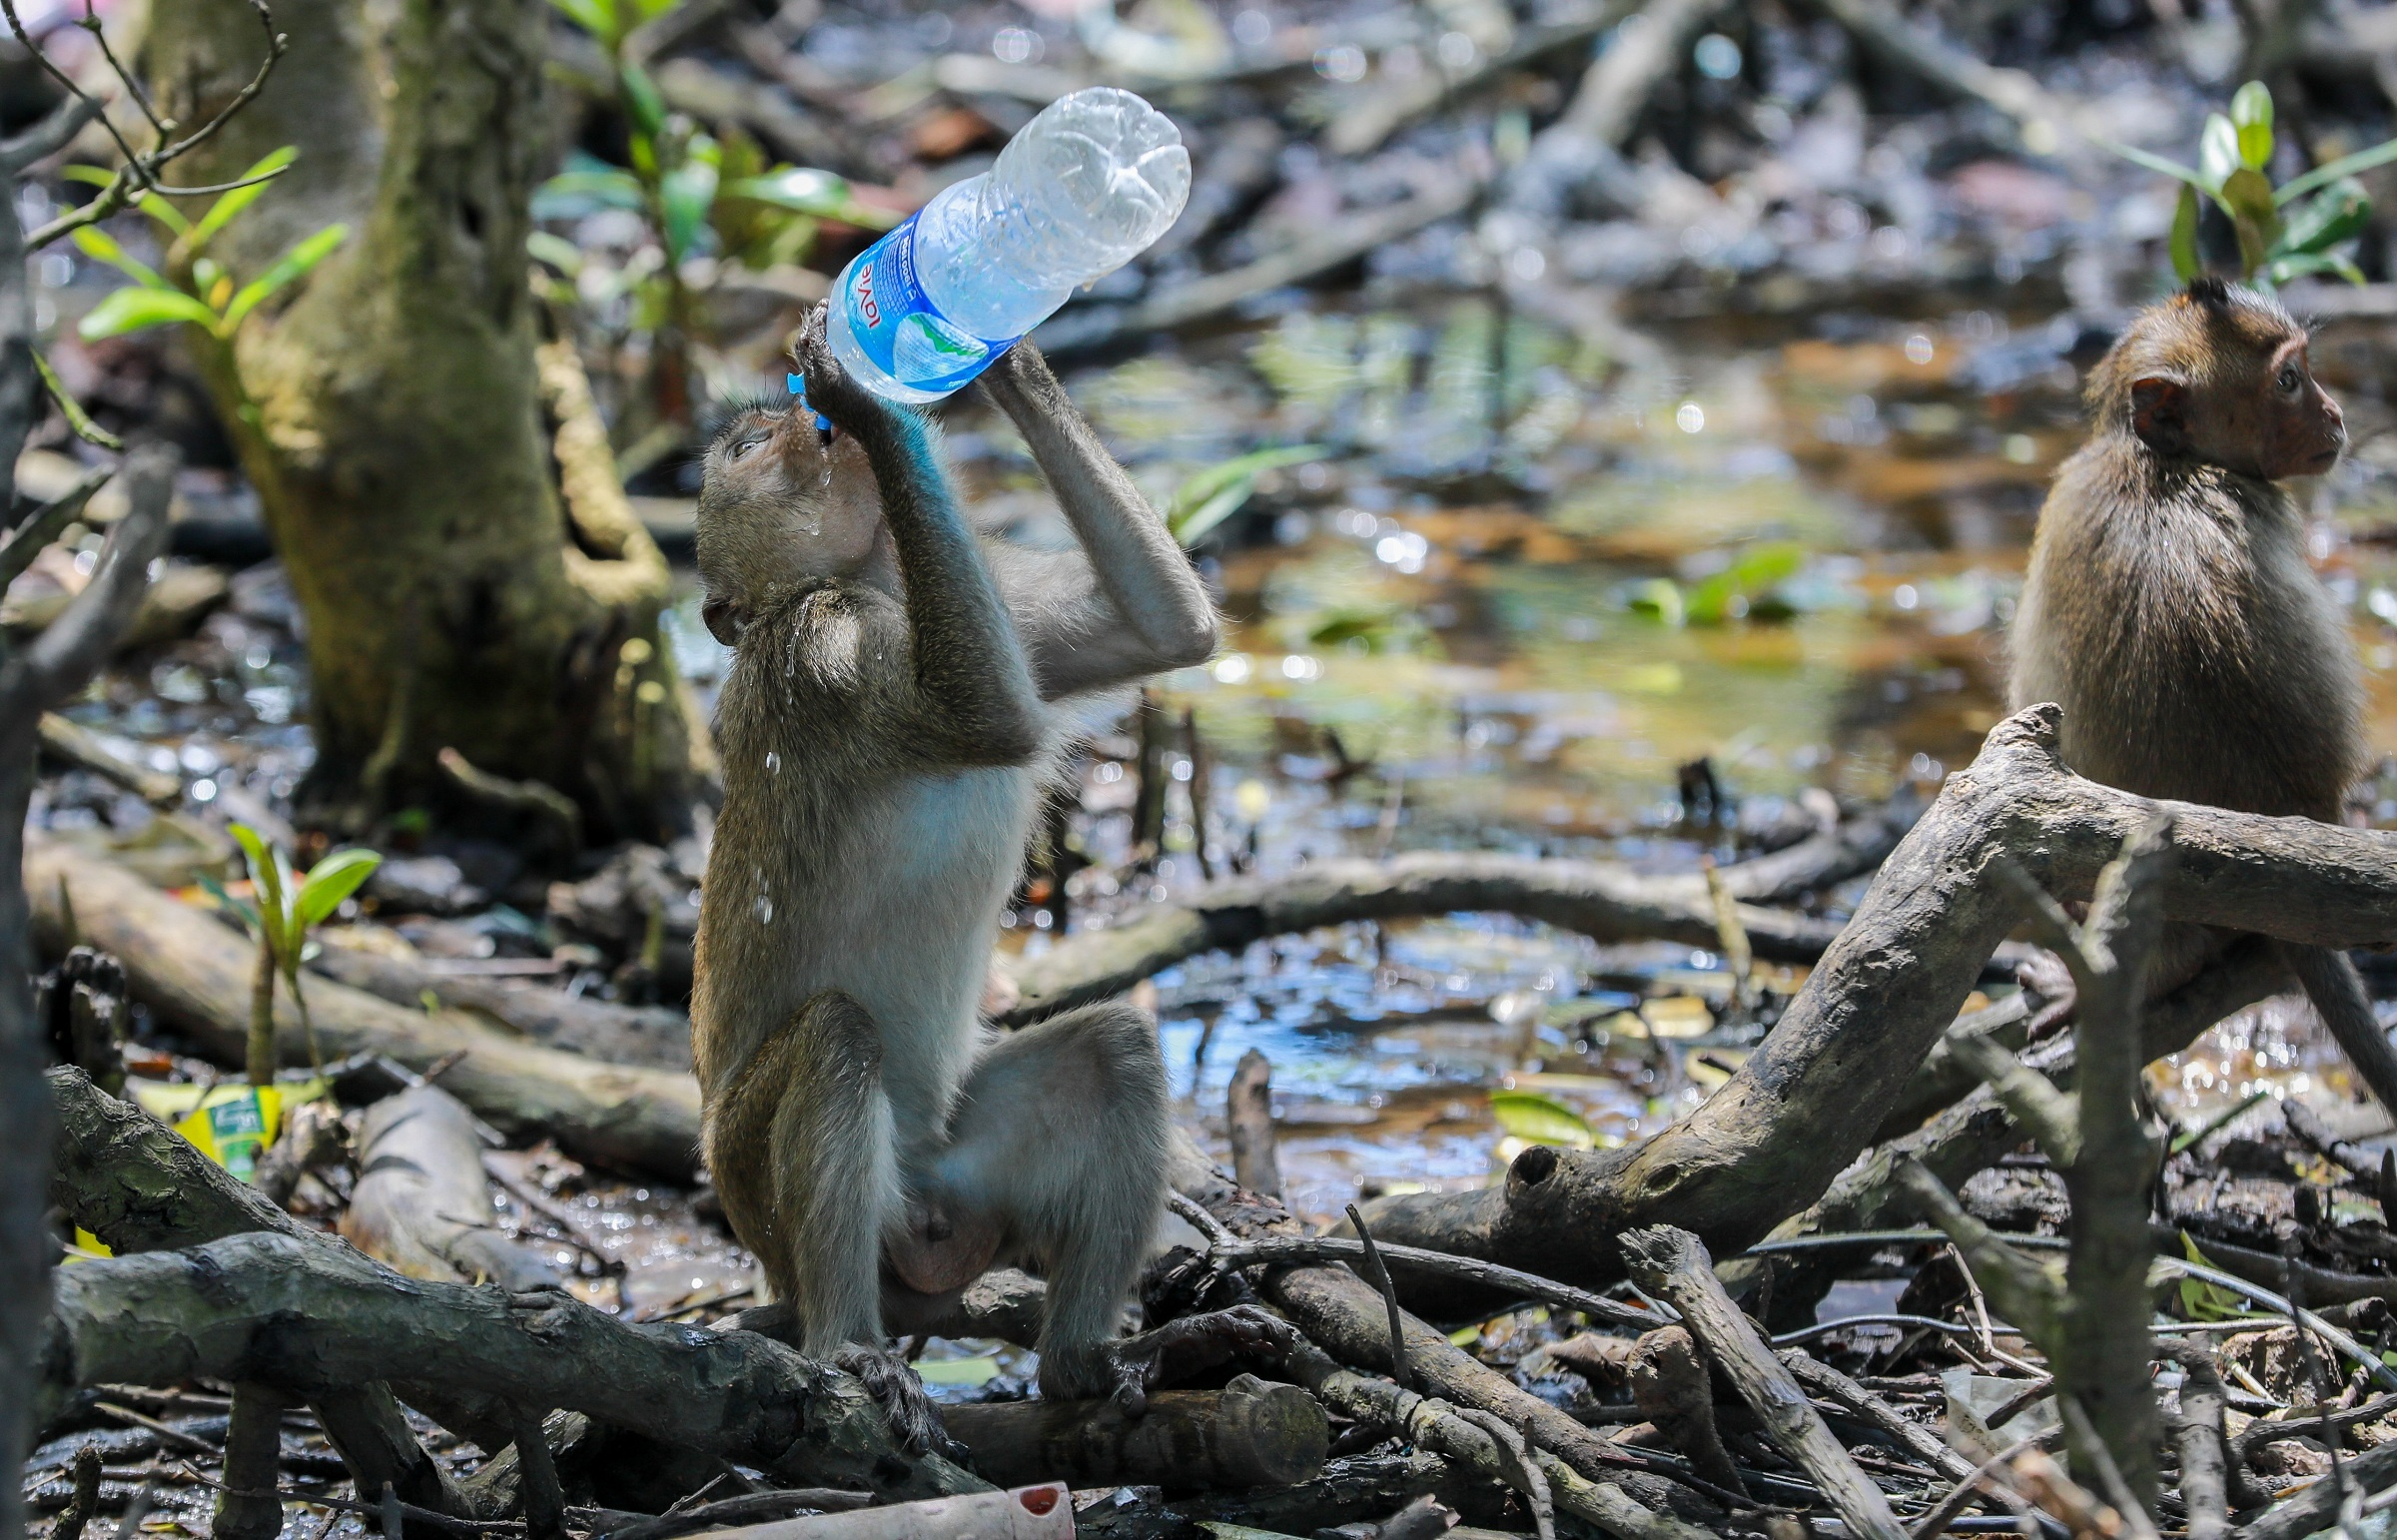 Saigon monkey colony provides feral delight